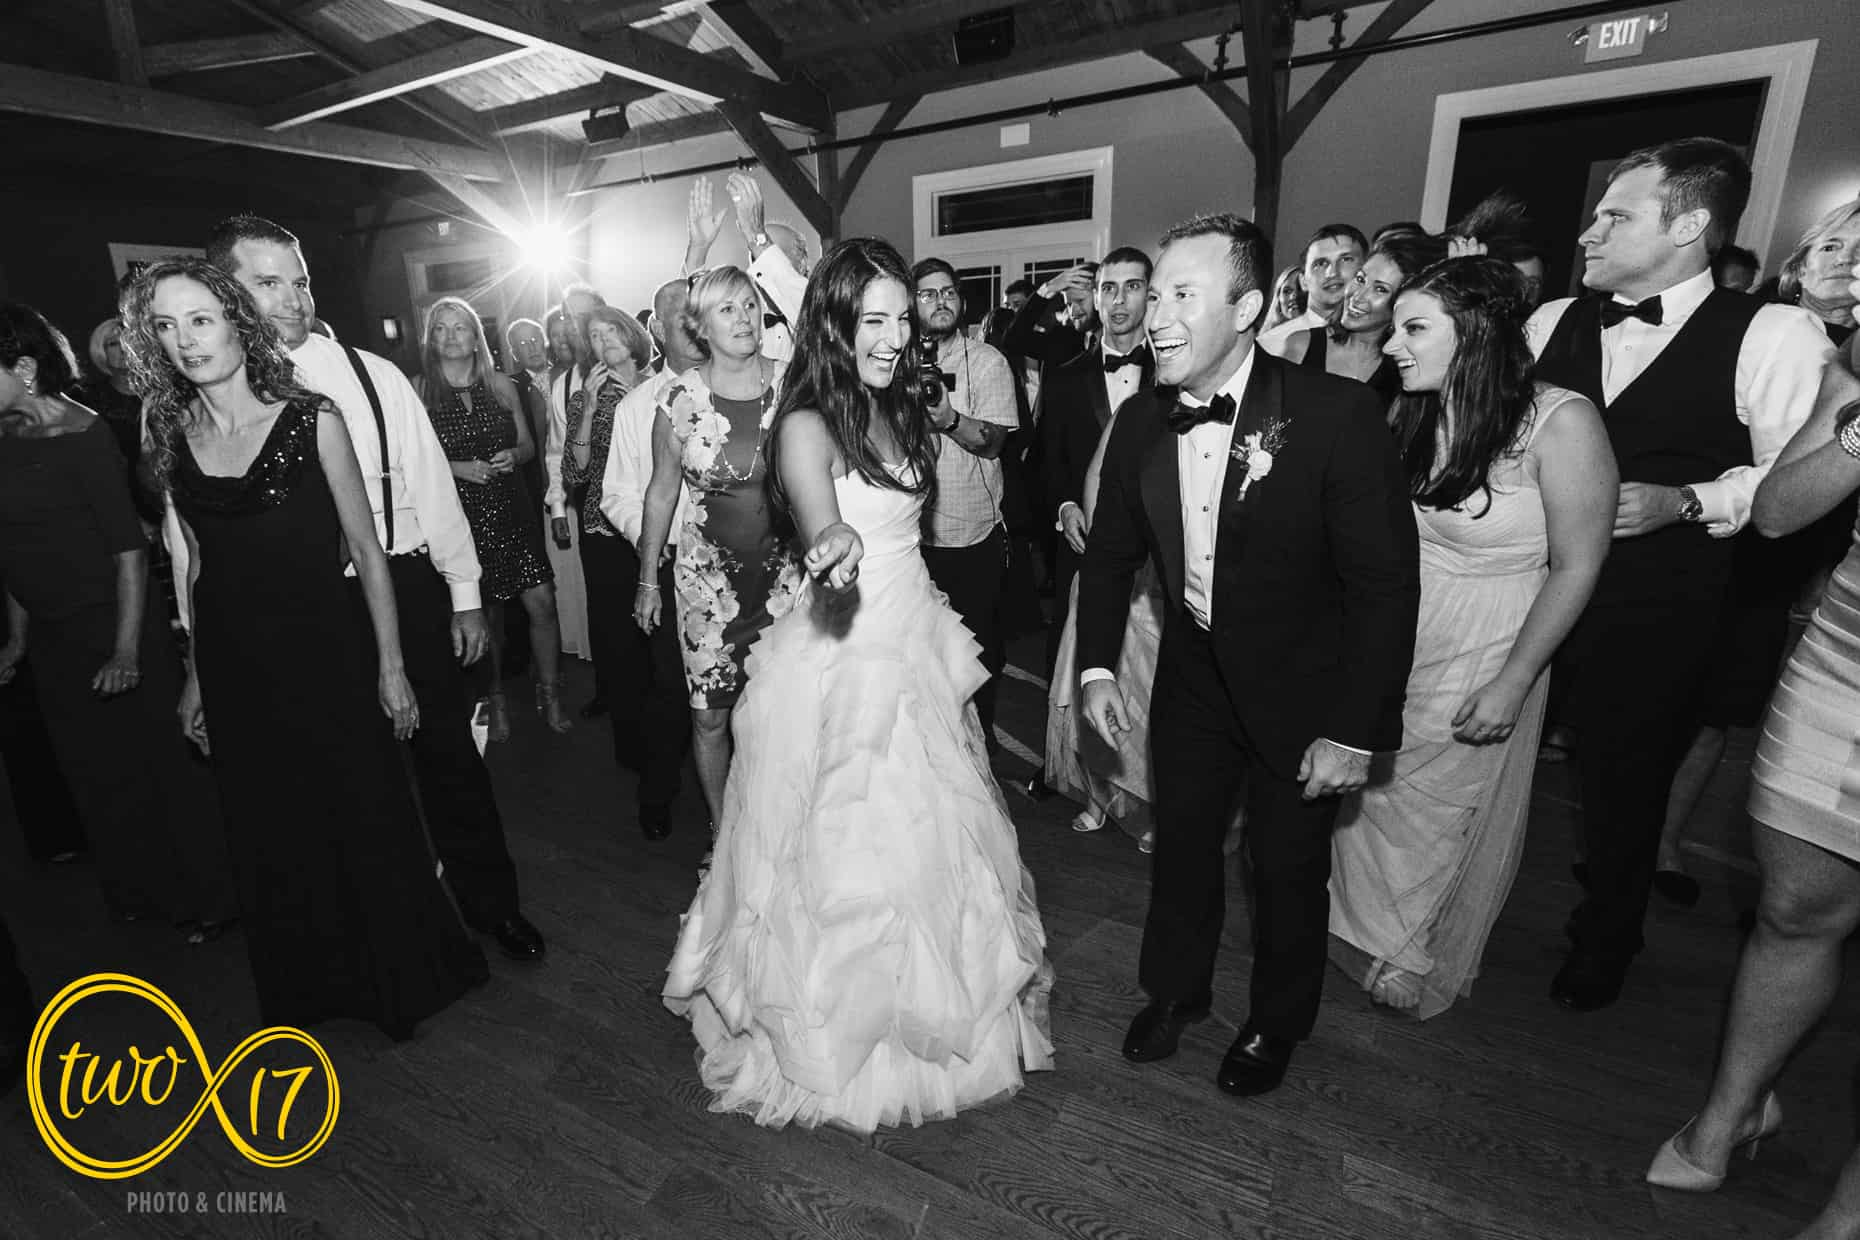 Kristen Barse BelMomento Weddings Cape May